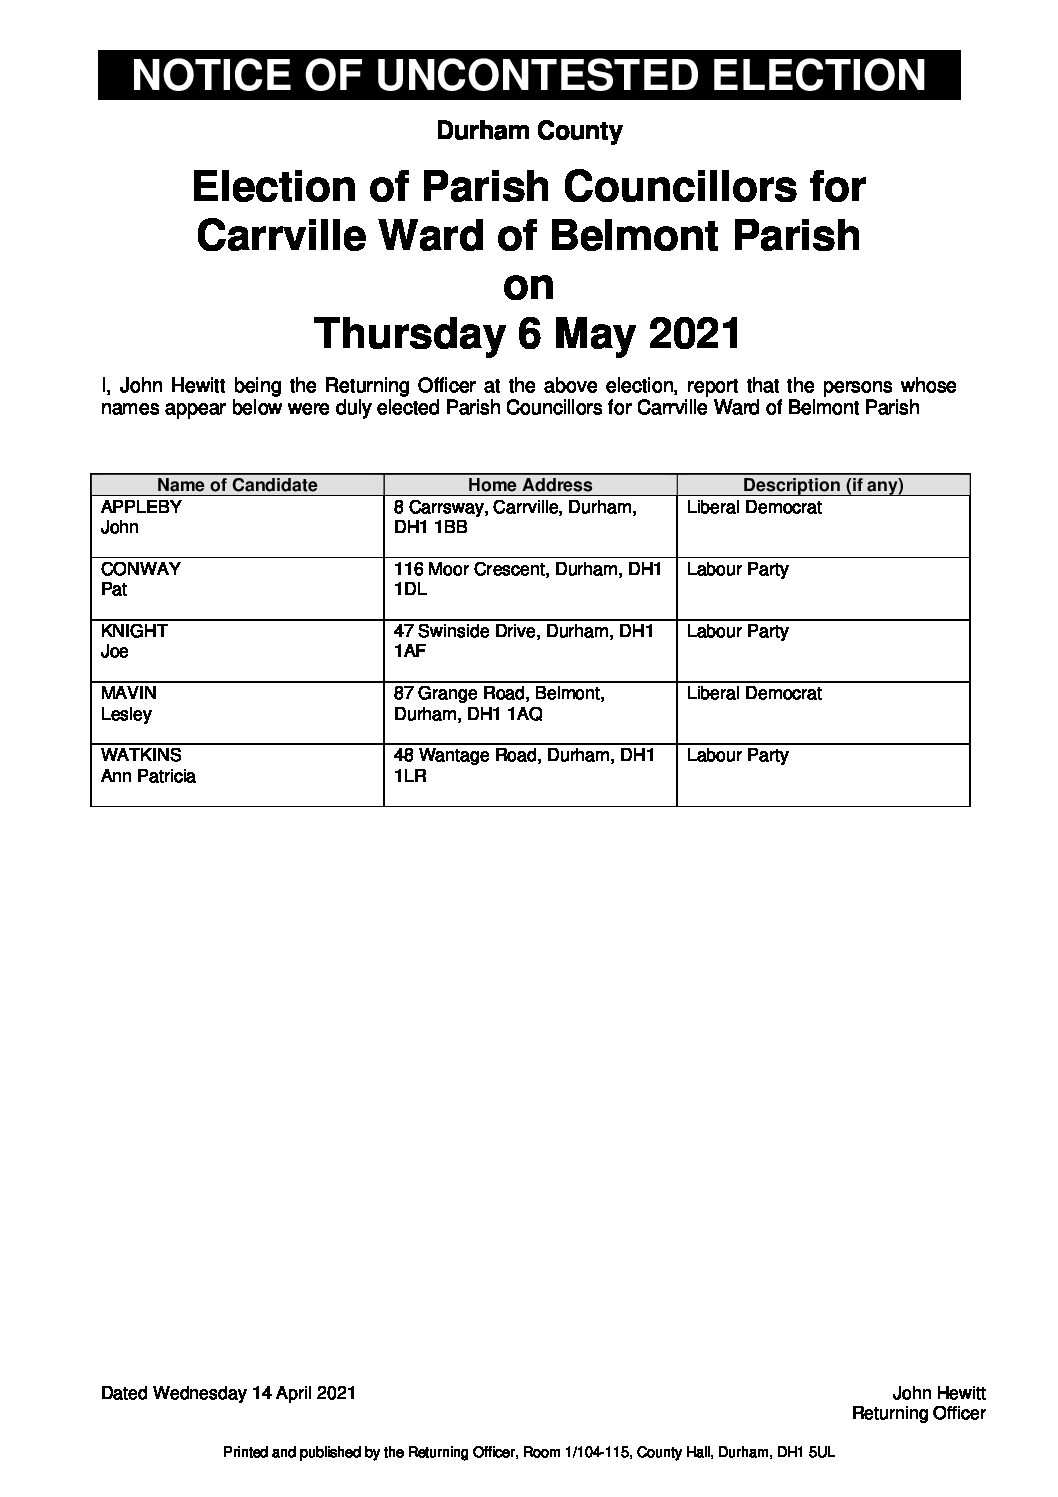 Belmont (Carrville) (1)